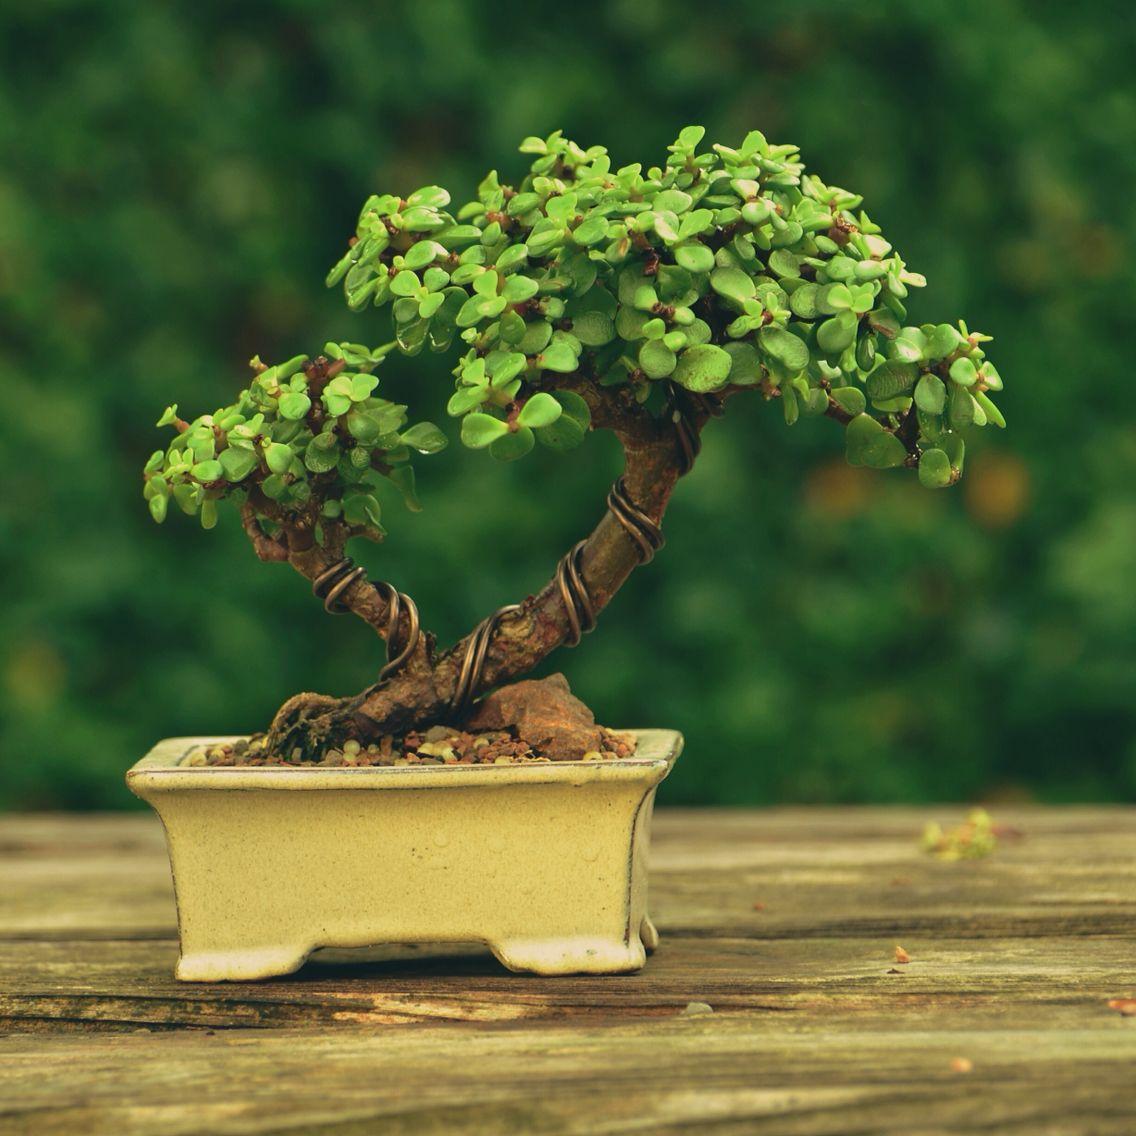 Portulacaria Afra Dwarf Jade Bonsai Tree By Gilbert Cantu With Little Jade Bonsai Jade Bonsai Bonsai Tree Indoor Bonsai Tree